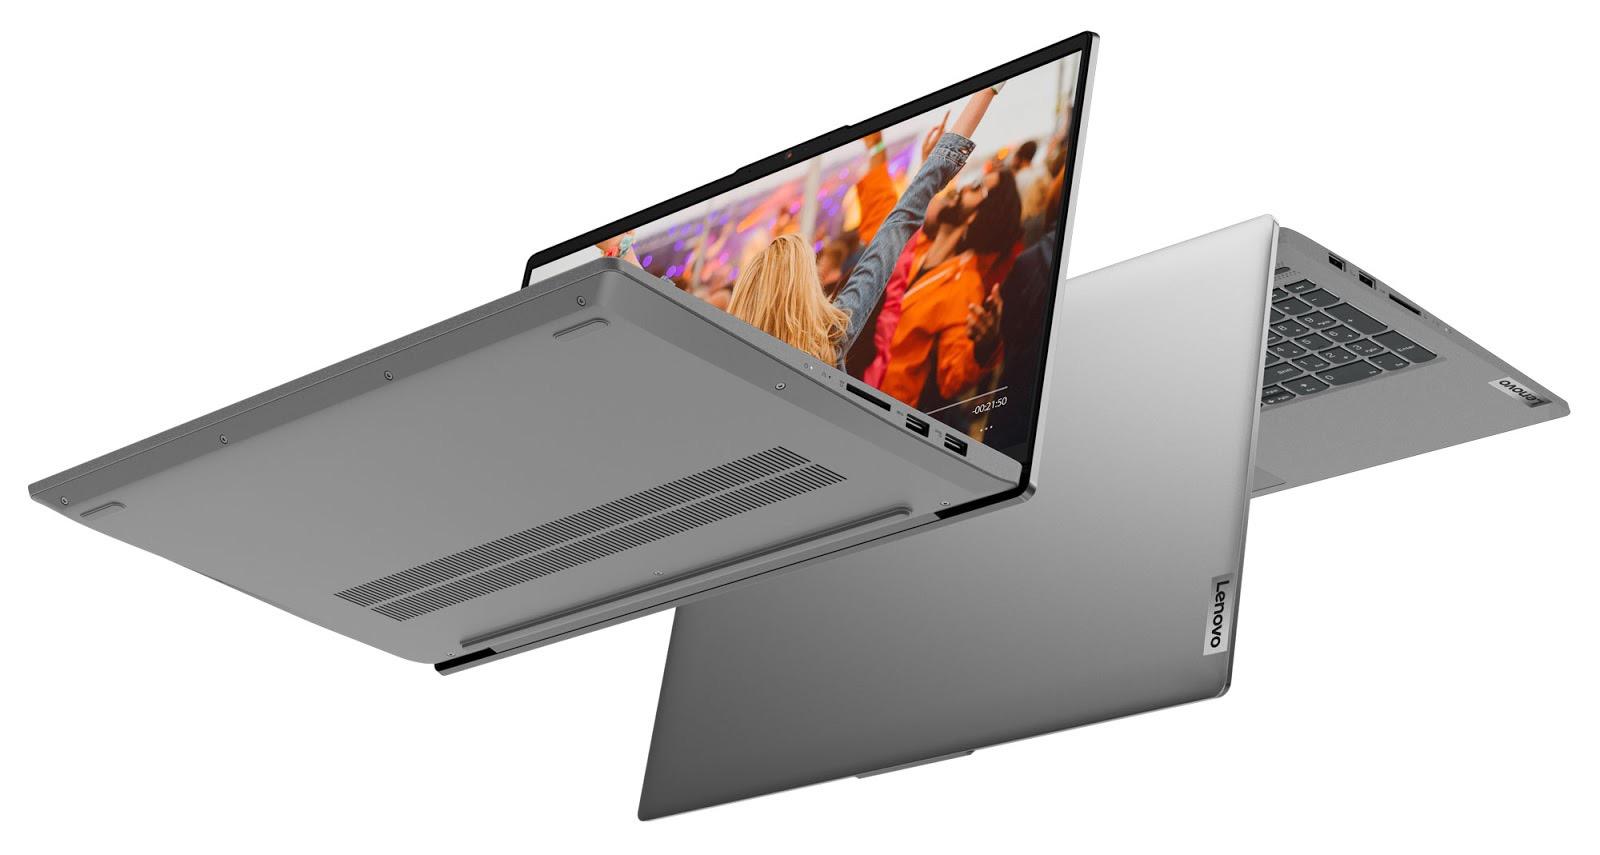 Фото 1. Ноутбук Lenovo ideapad 5 15IIL05 Platinum Grey (81YK00GBRE)